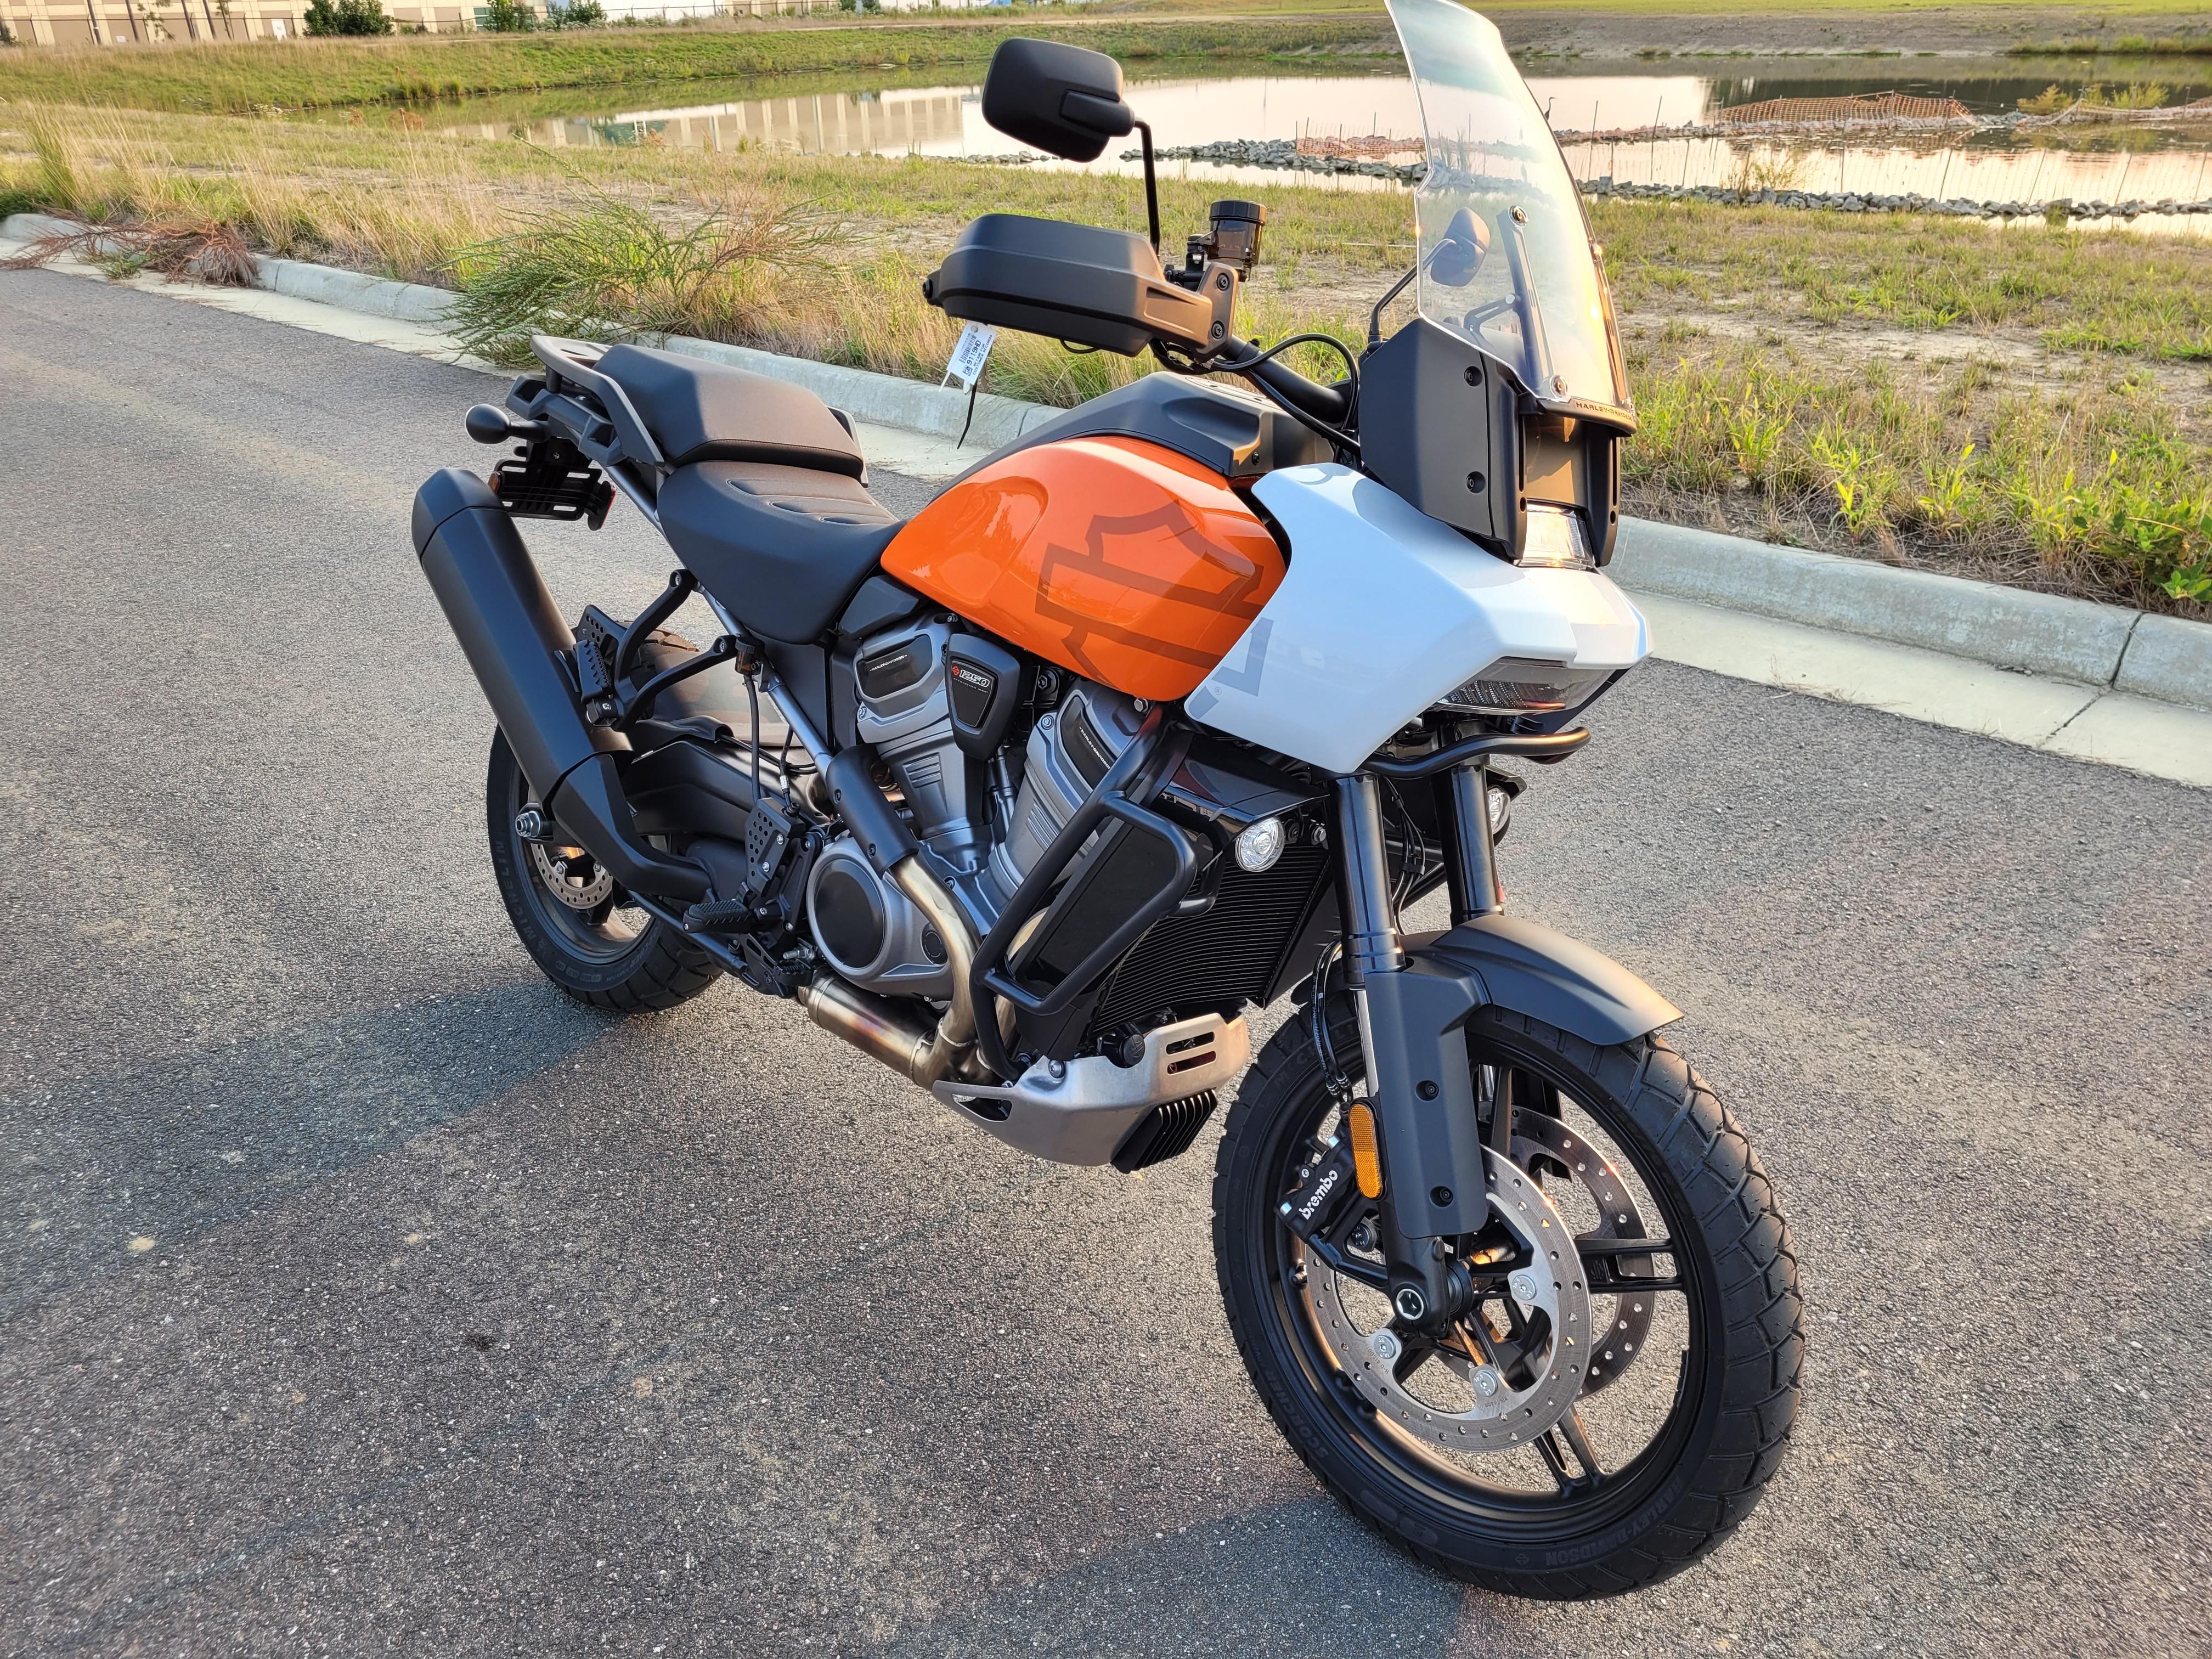 2021 Harley-Davidson Adventure Touring Pan America 1250 Special at Richmond Harley-Davidson